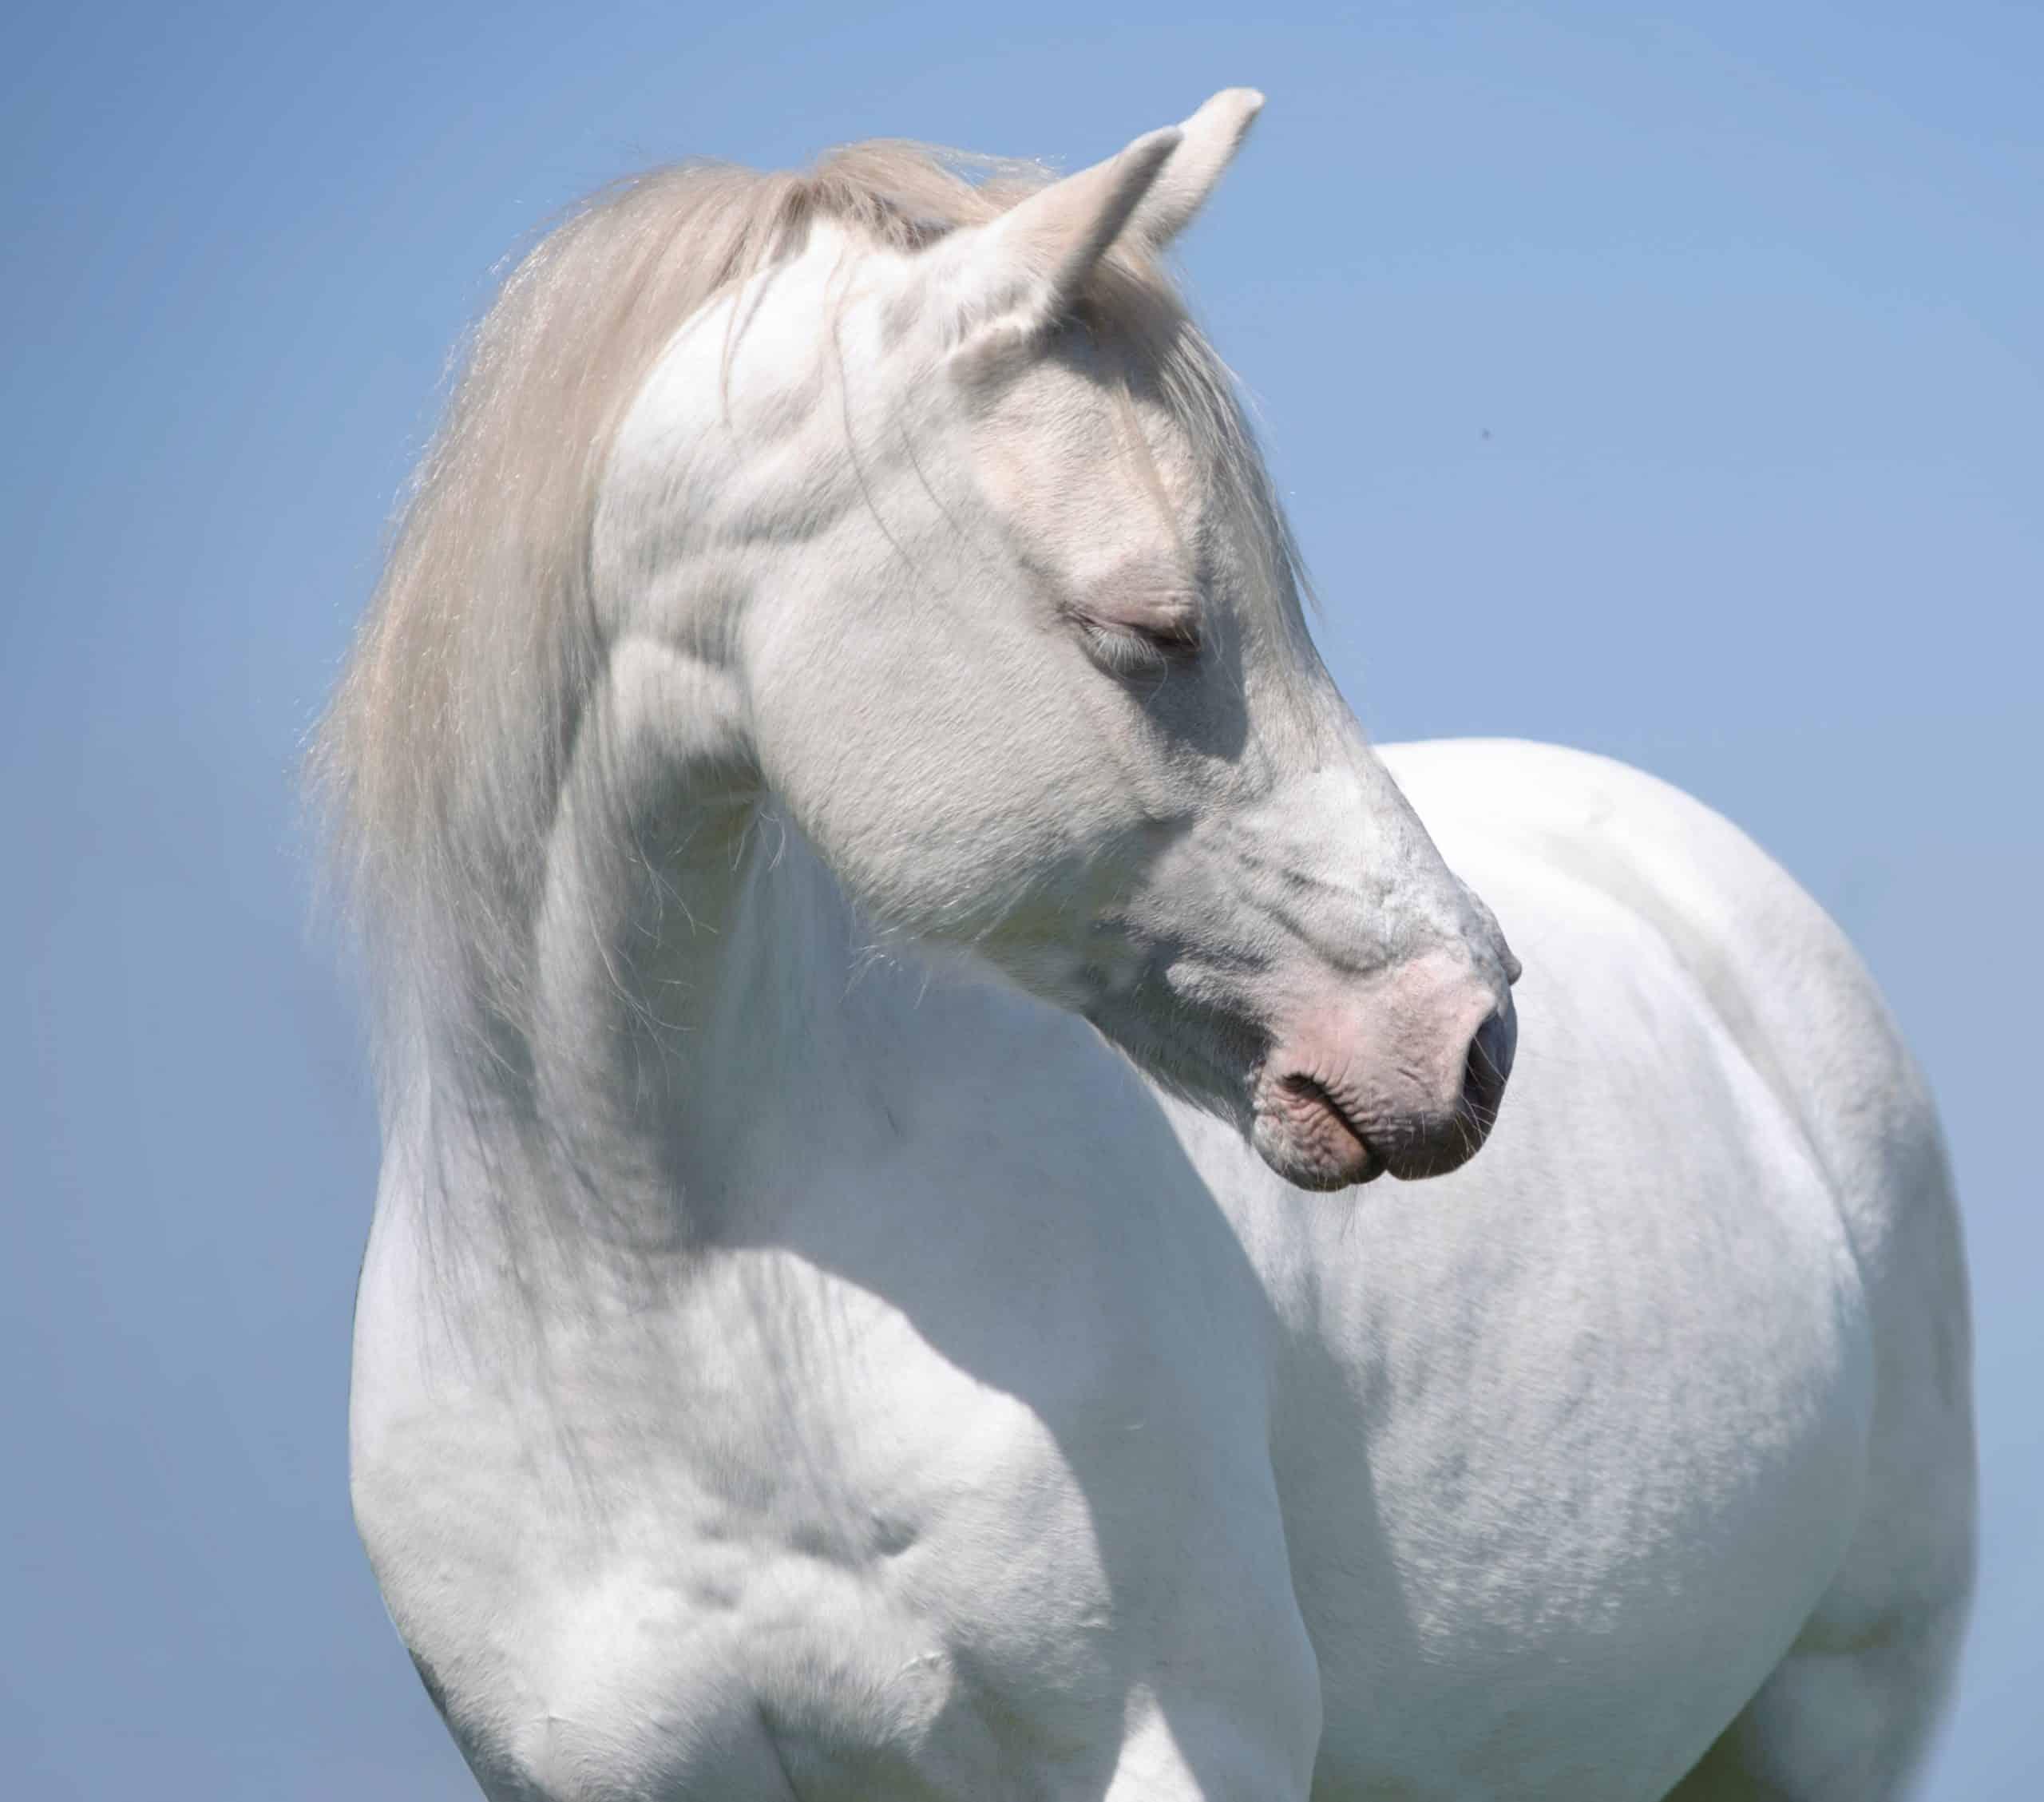 white cremello horse portrait on the blue sky